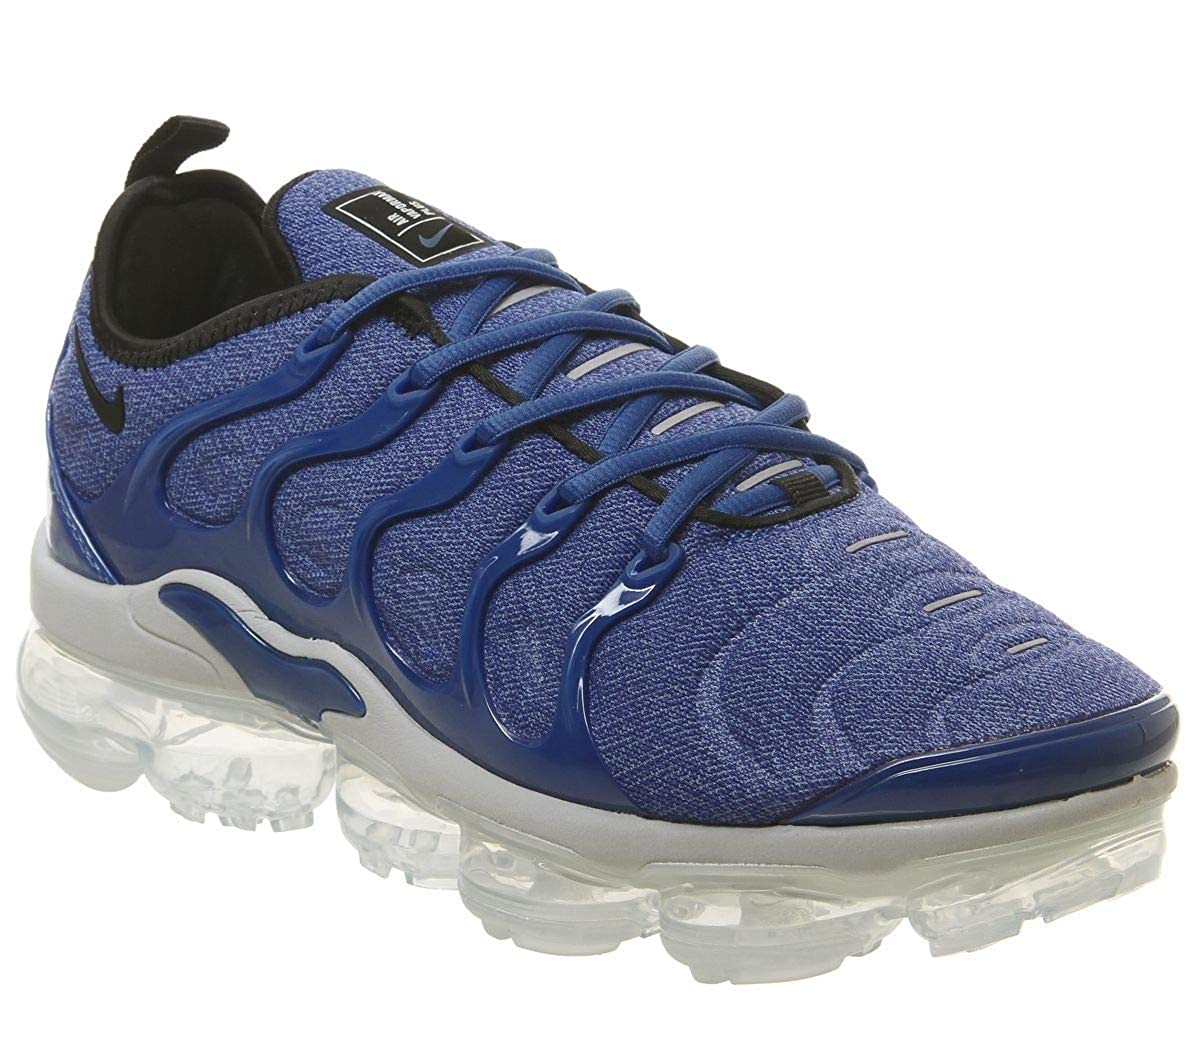 Mehrfarbig (Game Royal schwarz-wolf grau-racer Blau 404) Nike Herren Air Vapormax Plus Multisport Indoor Schuhe